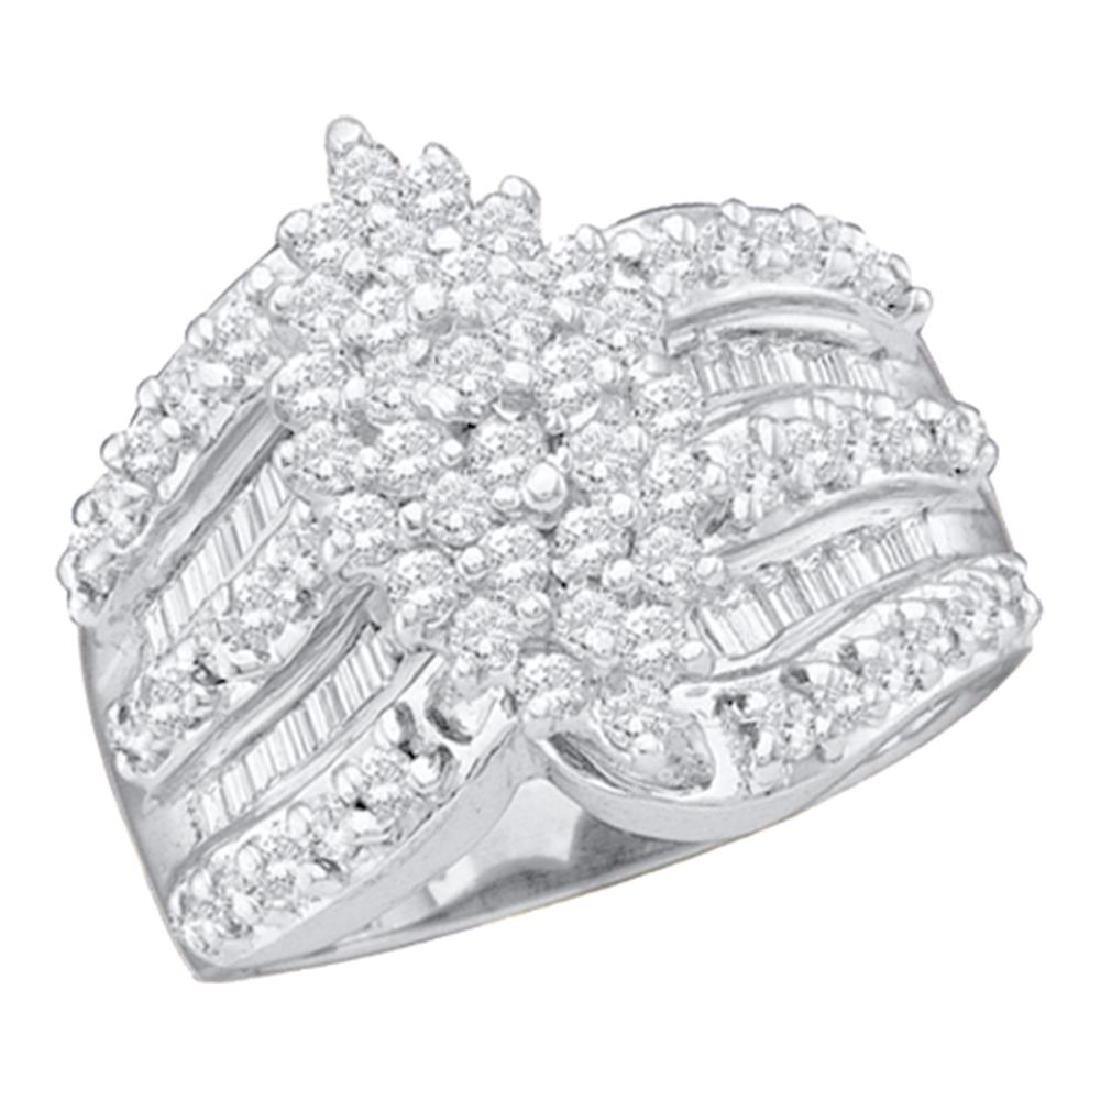 1.02 CTW Diamond Oval-shape Cluster Ring 10KT White